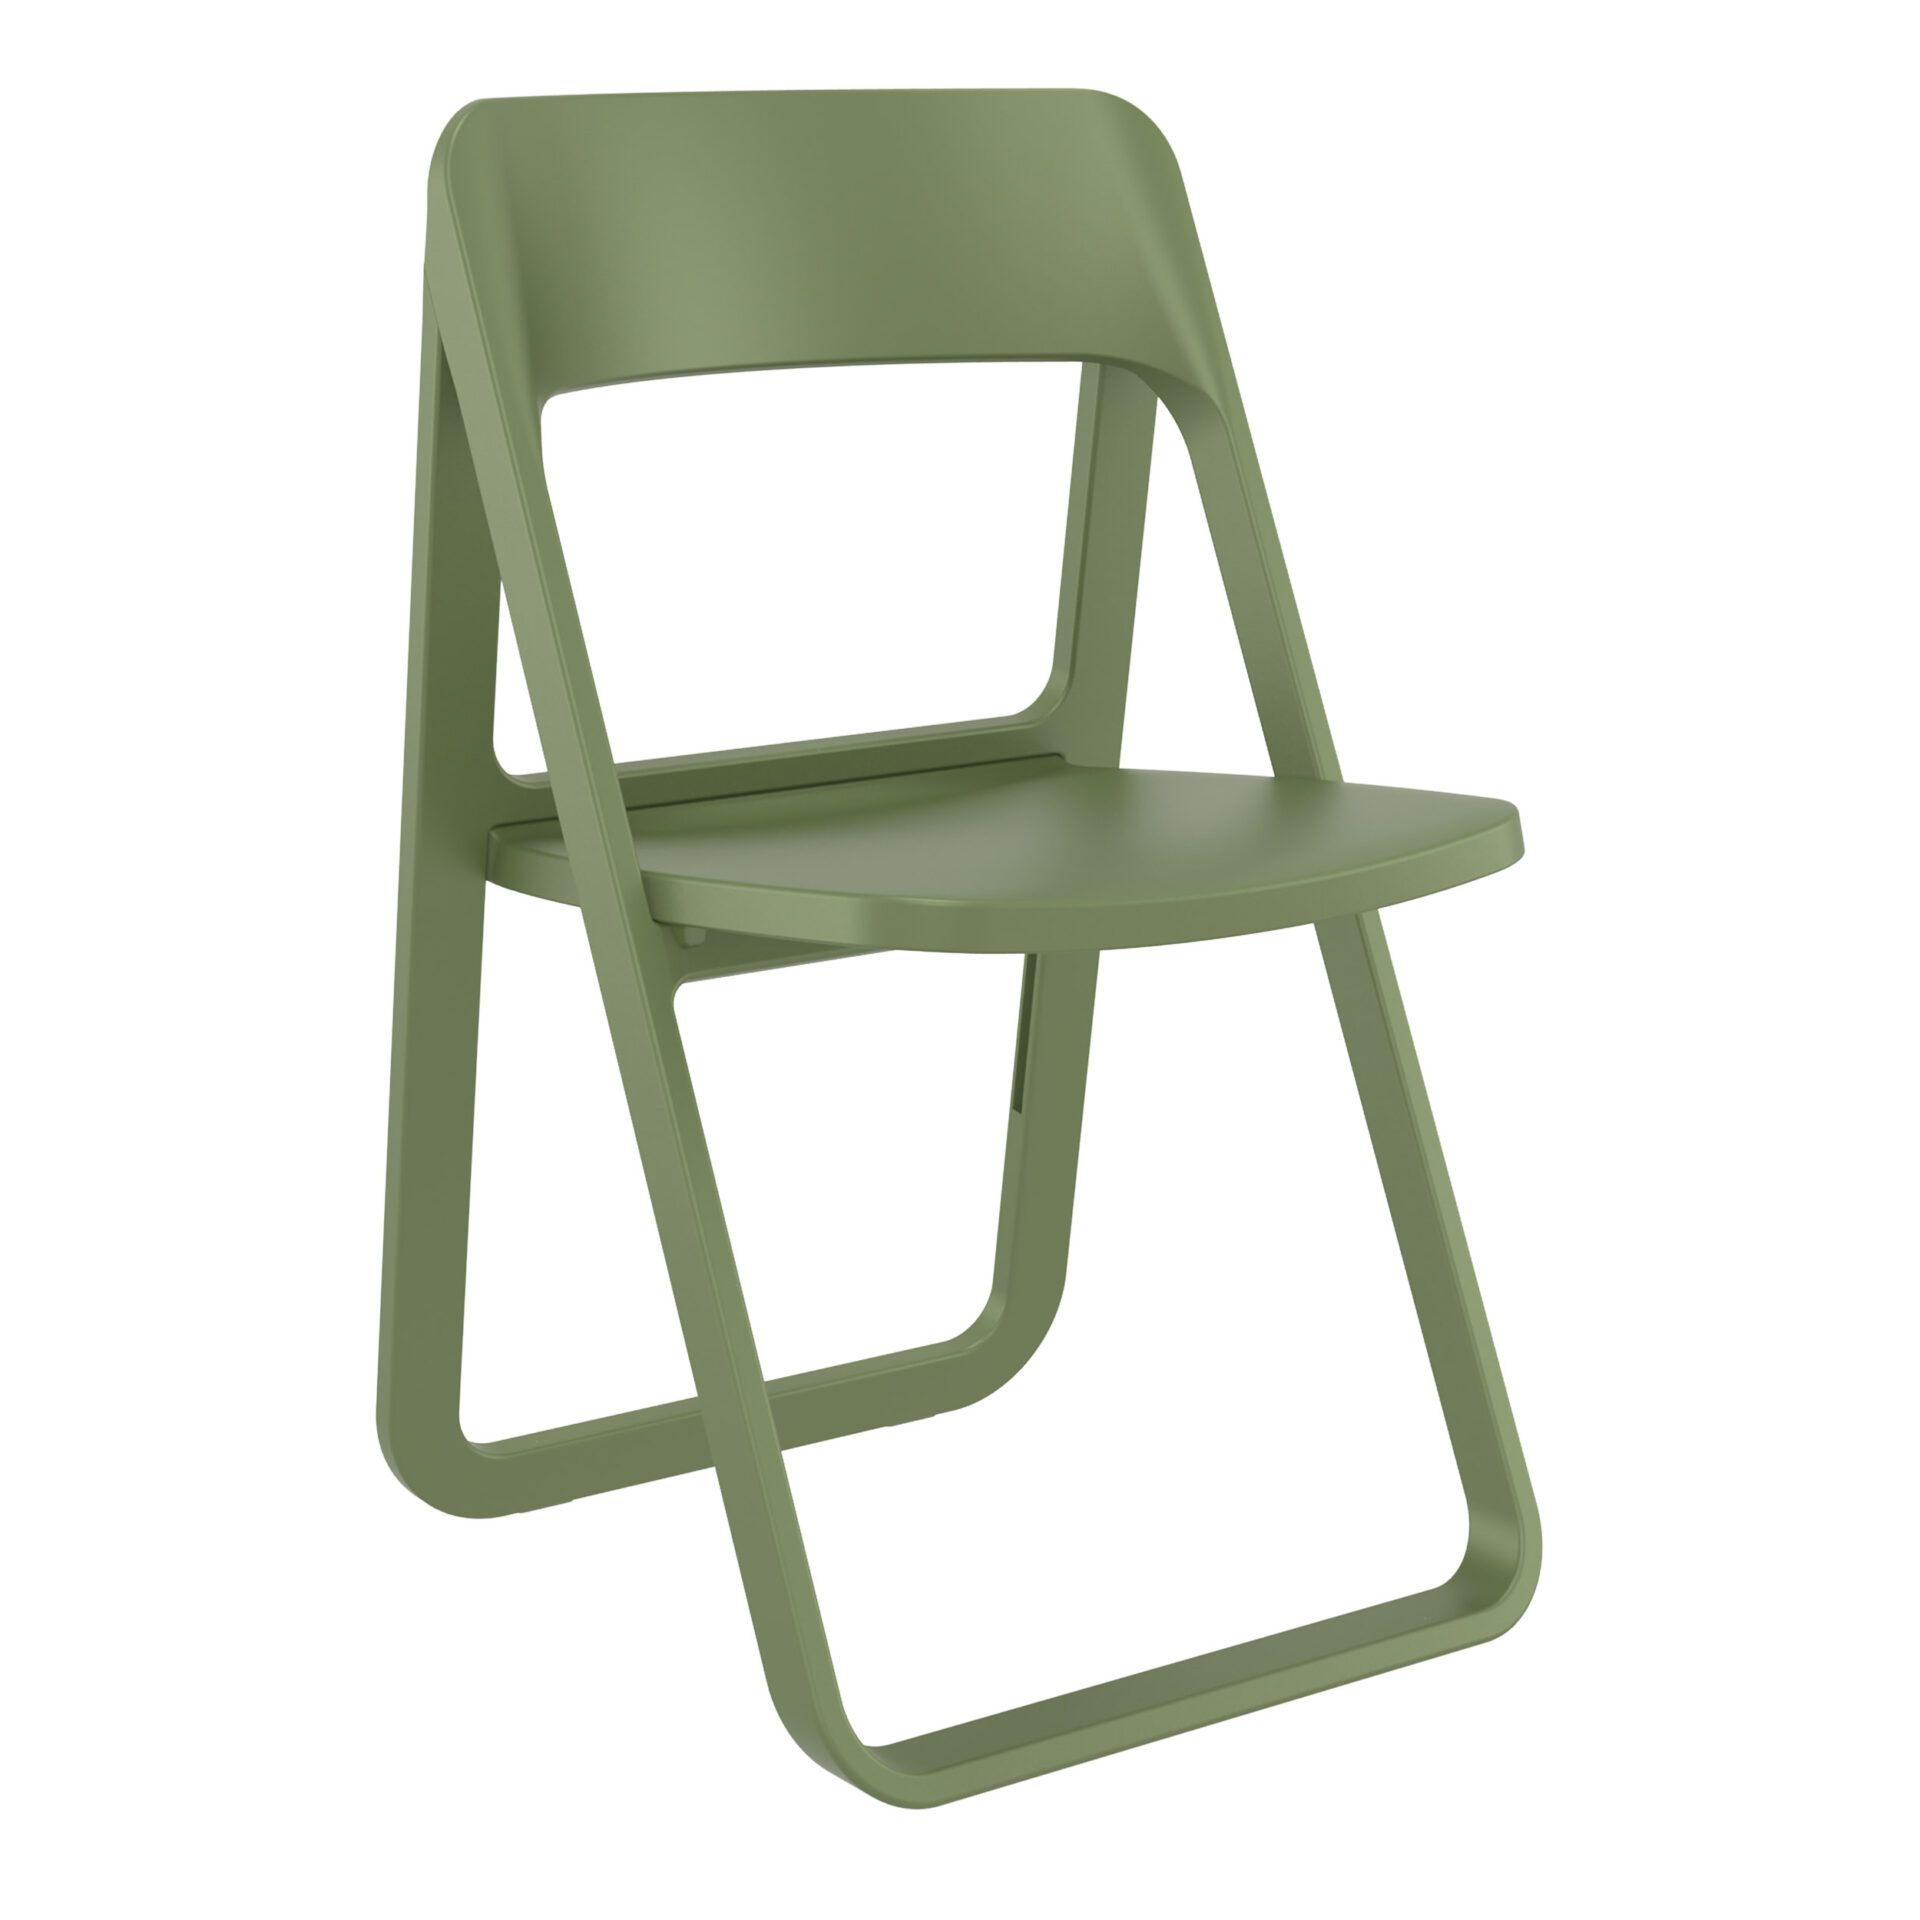 polypropylene dream folding chair olive green front side